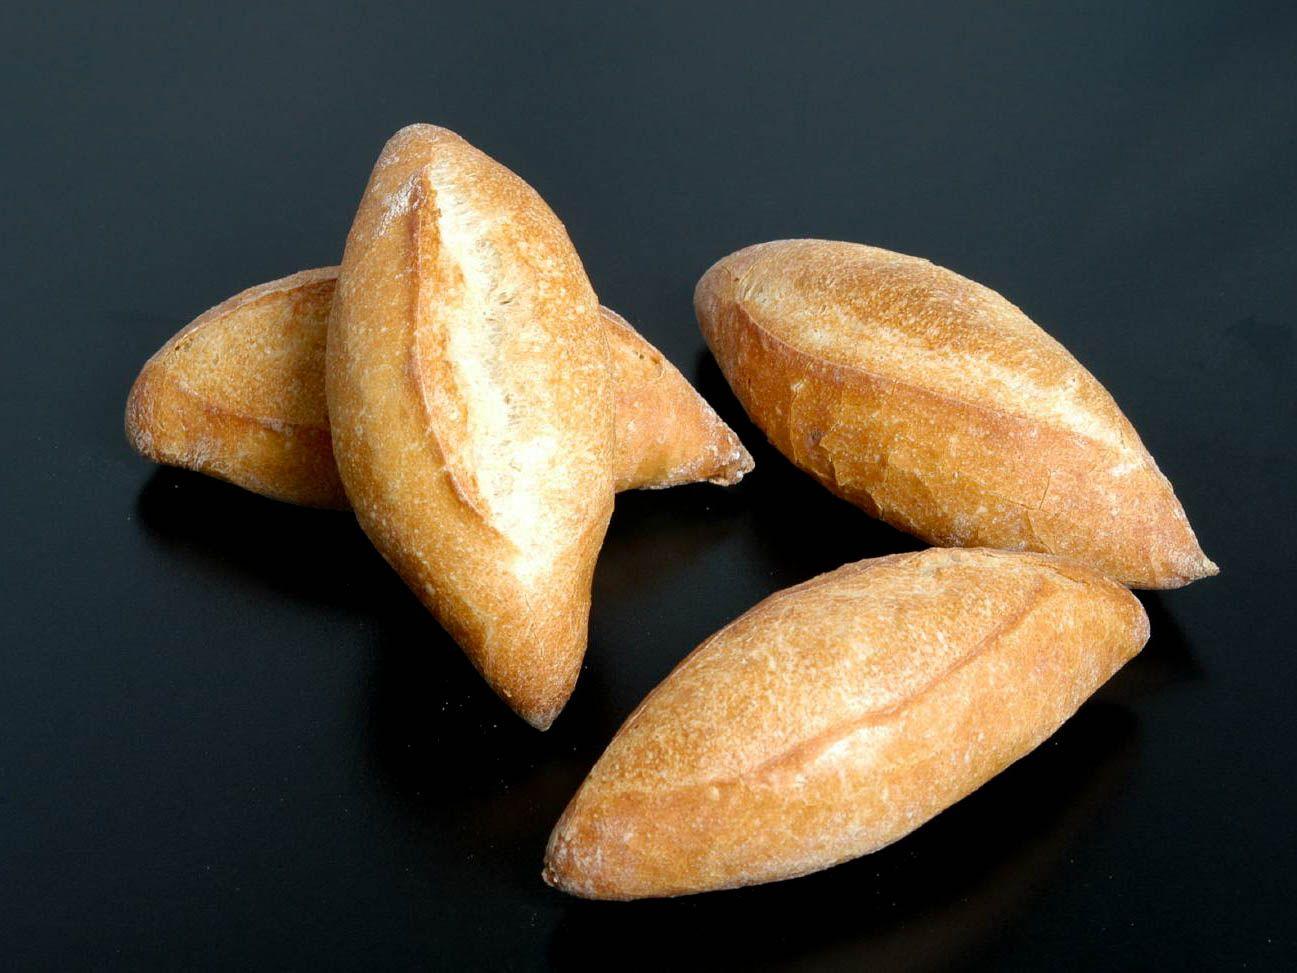 20150421-tortastom-cat-bakery-bolillo-craig-cavallo.jpg